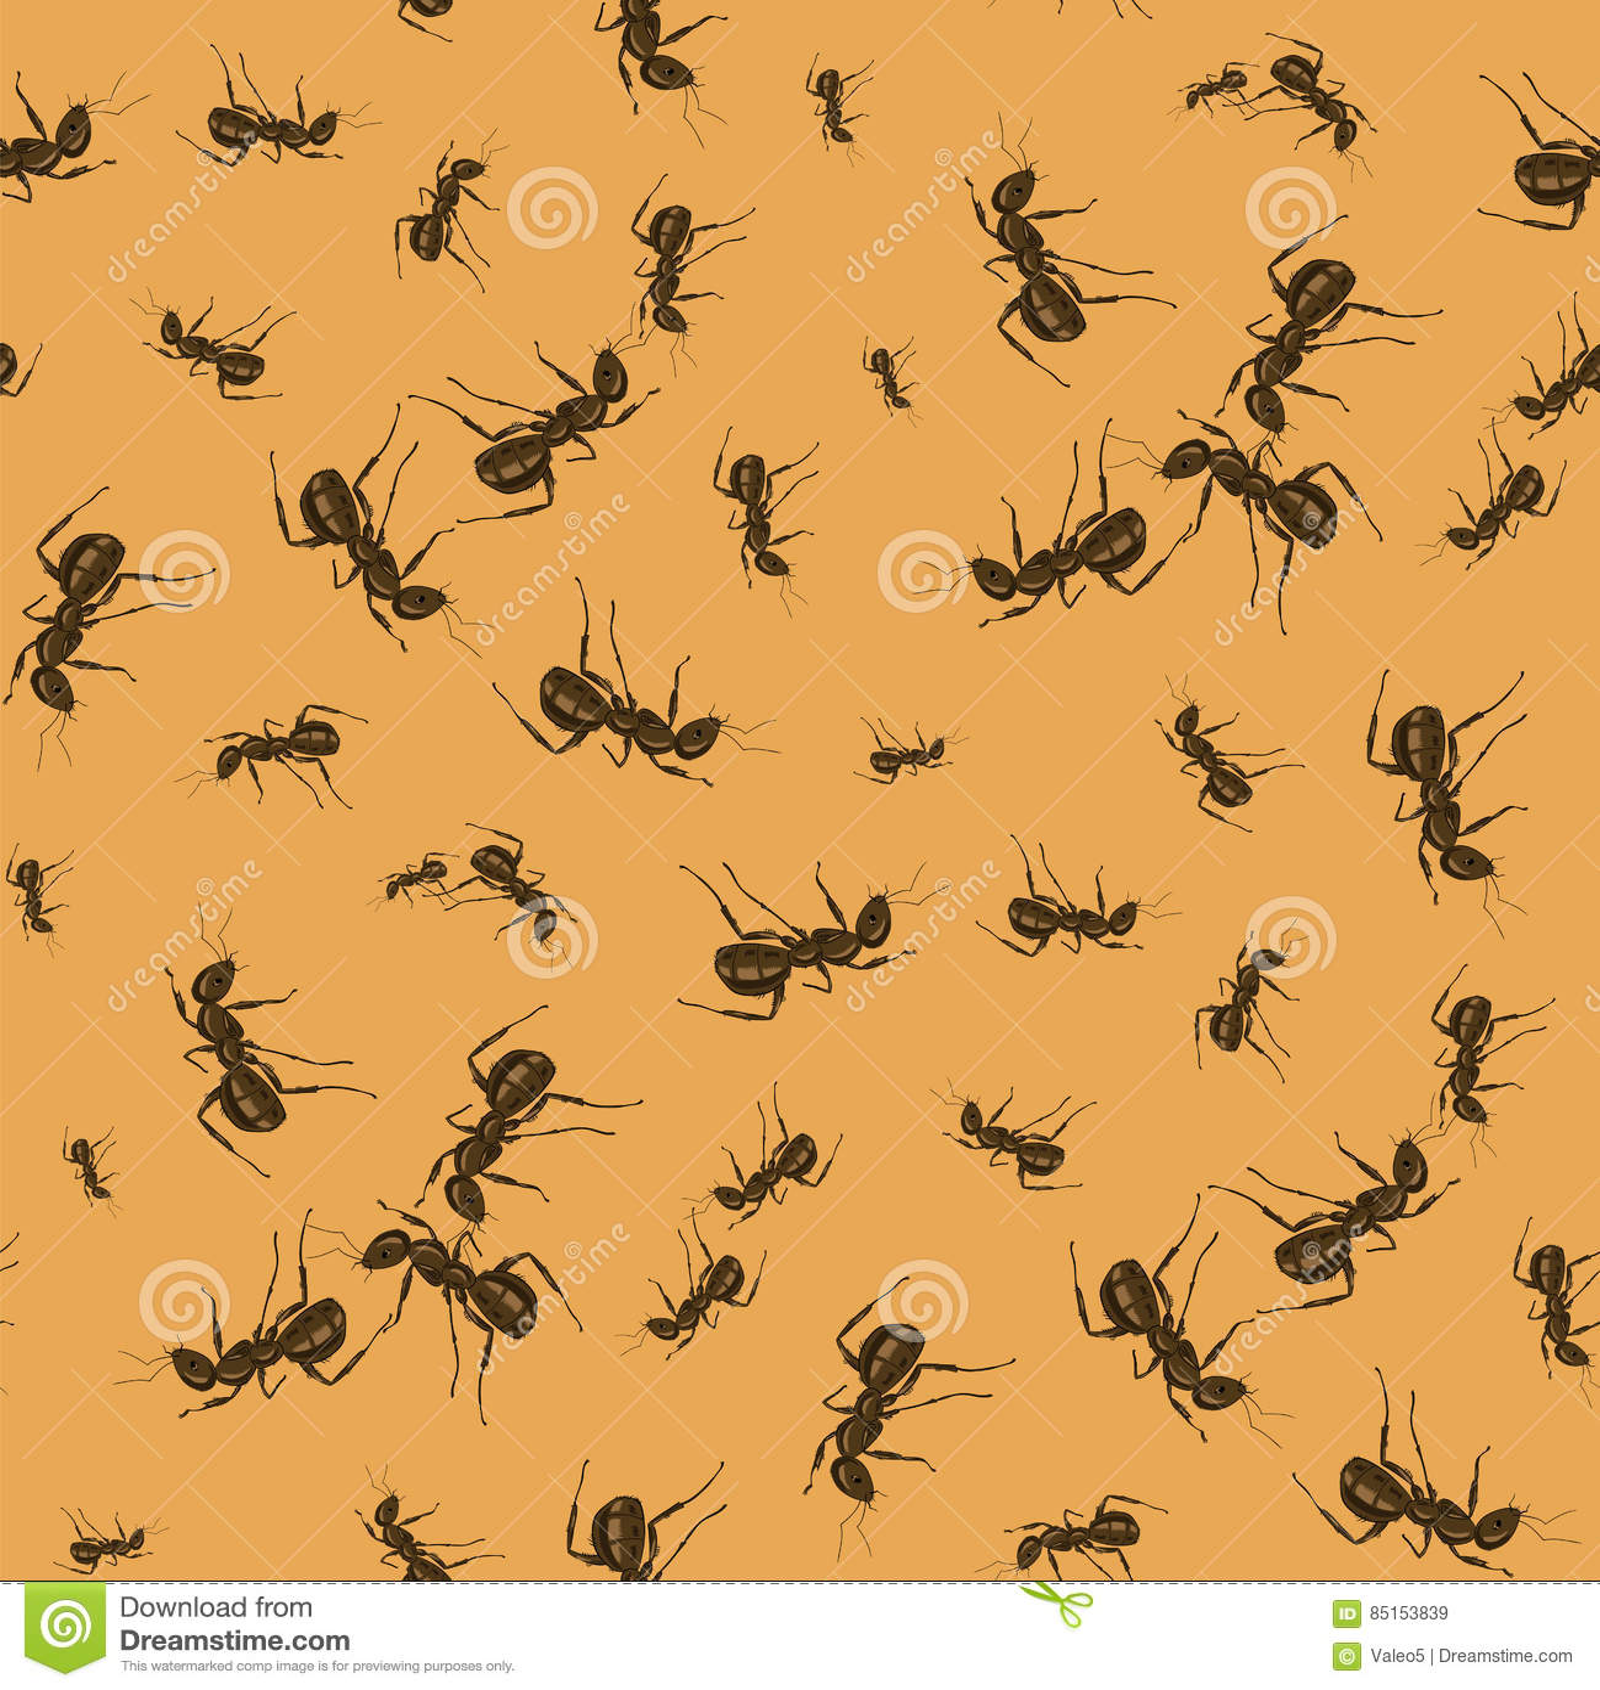 Ant Seamless Pattern